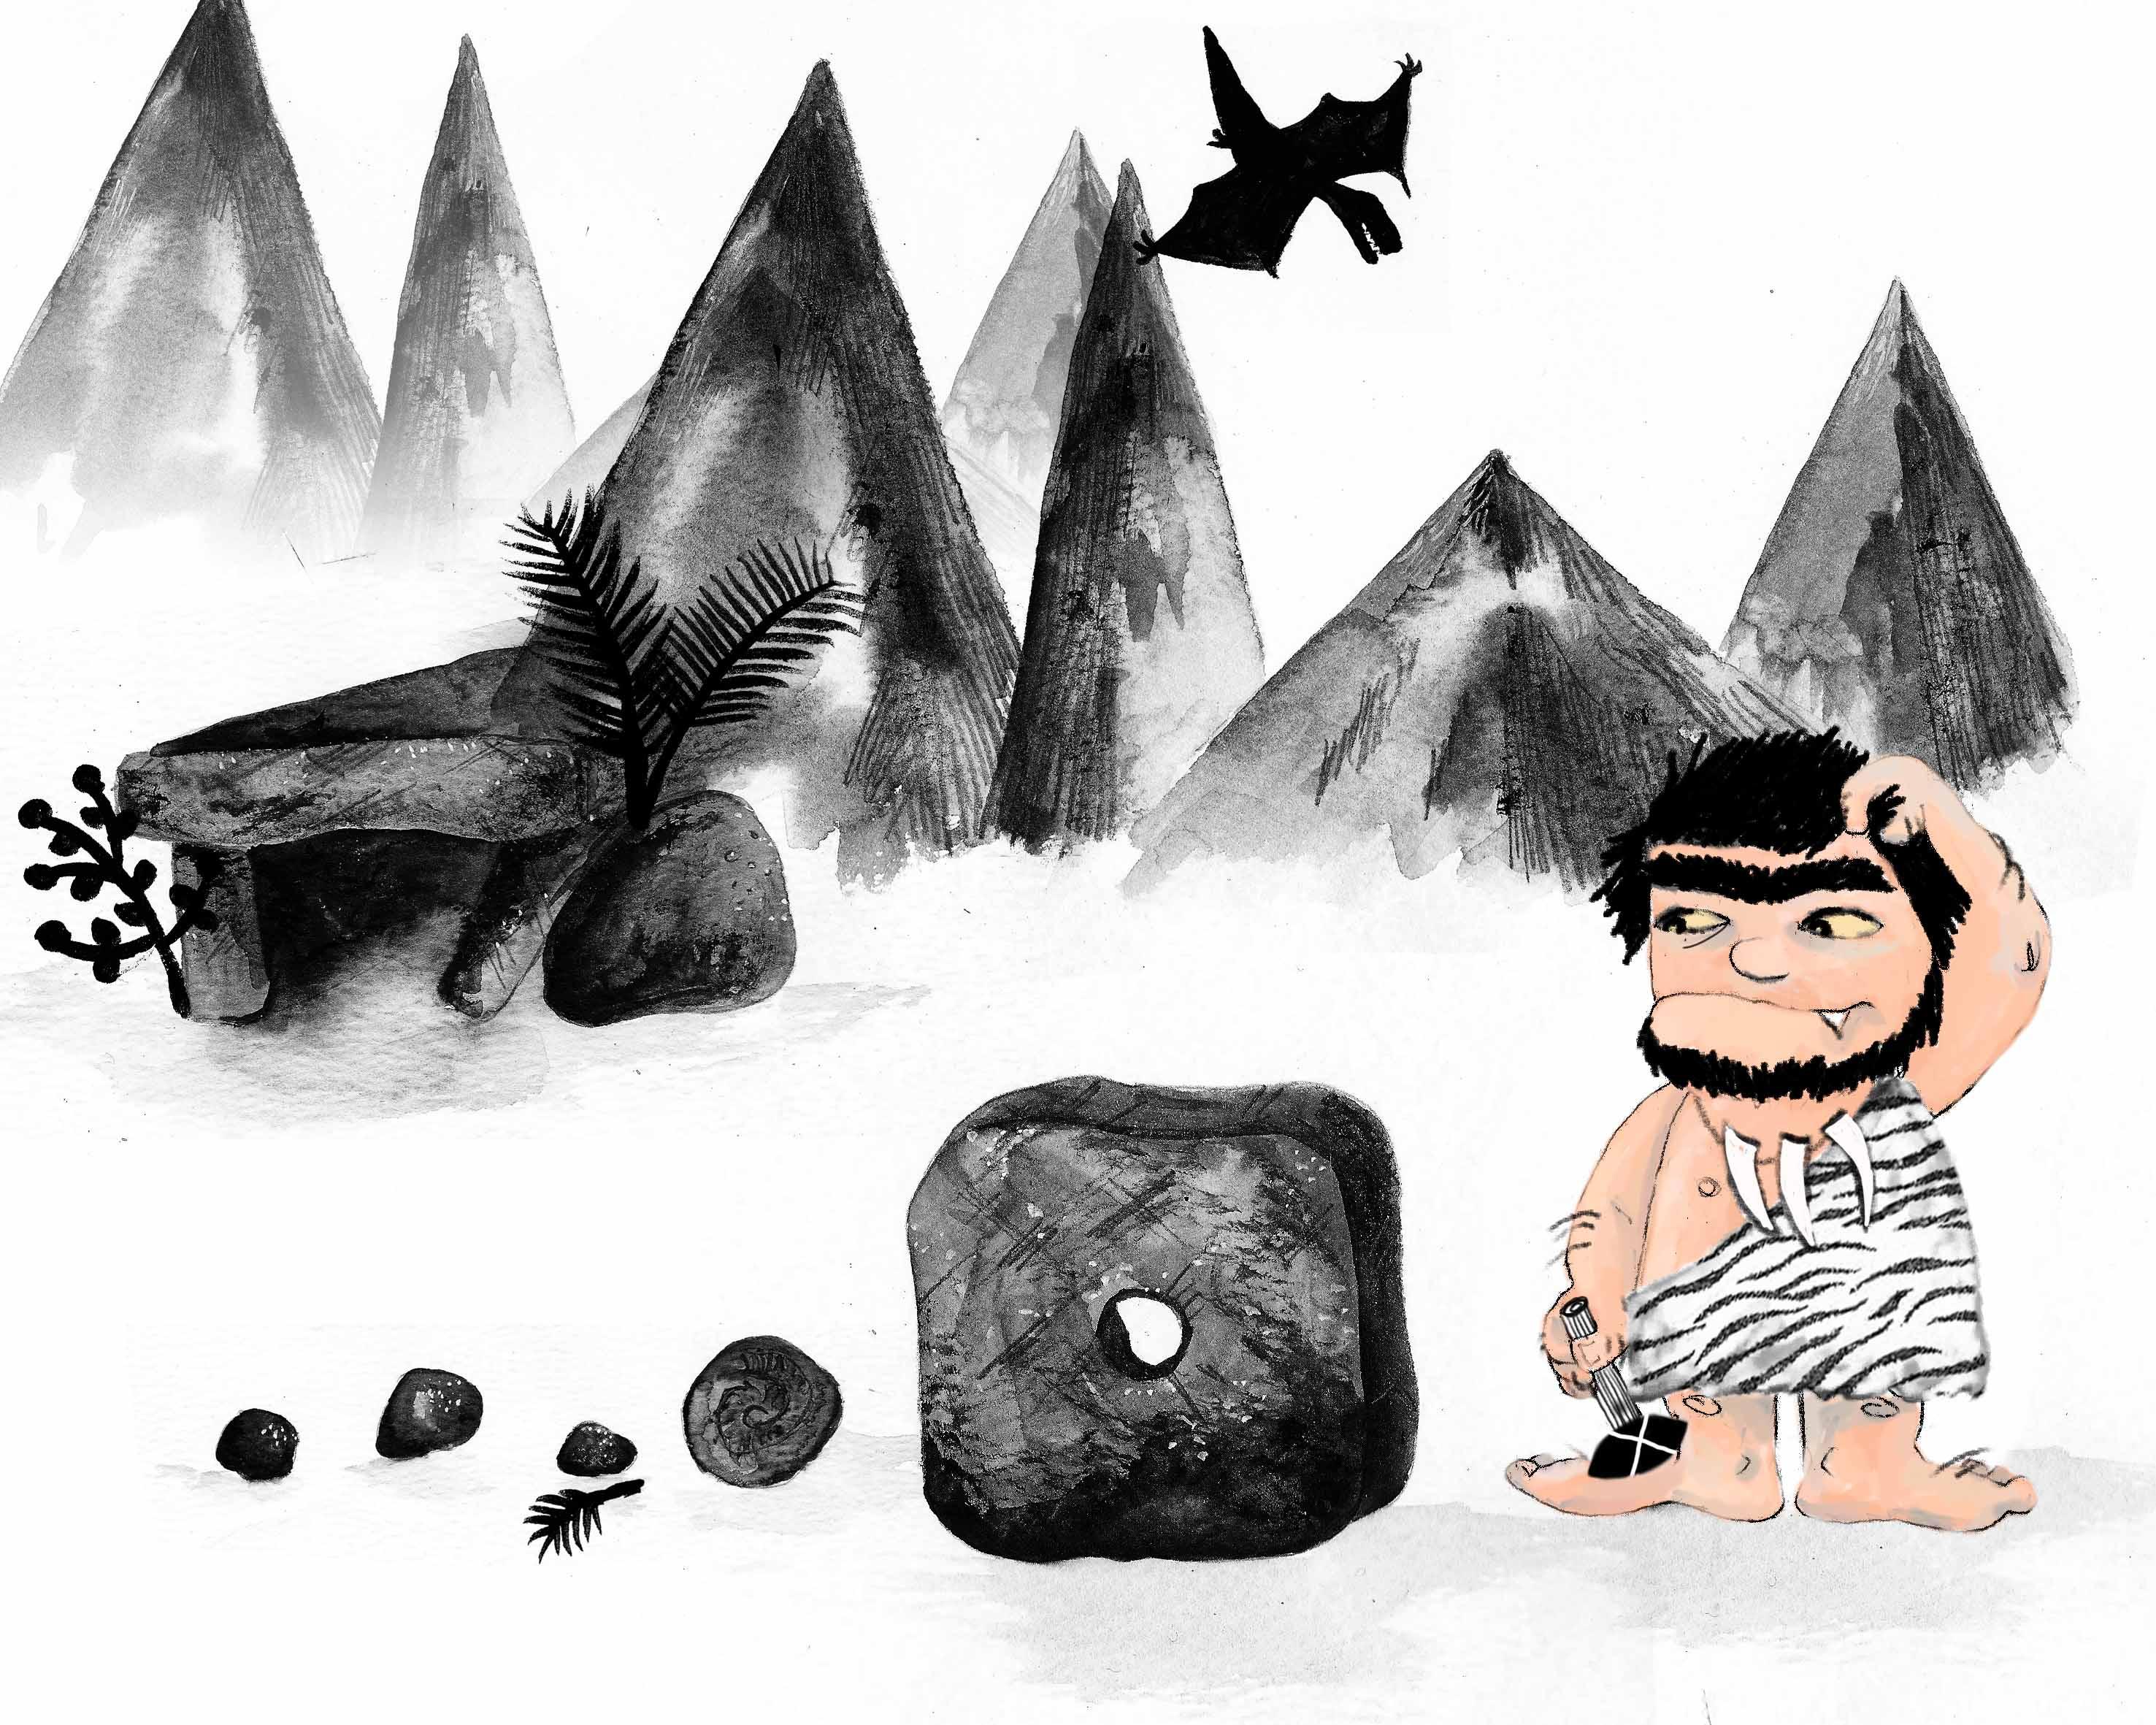 Caveman and Wheel Illustration